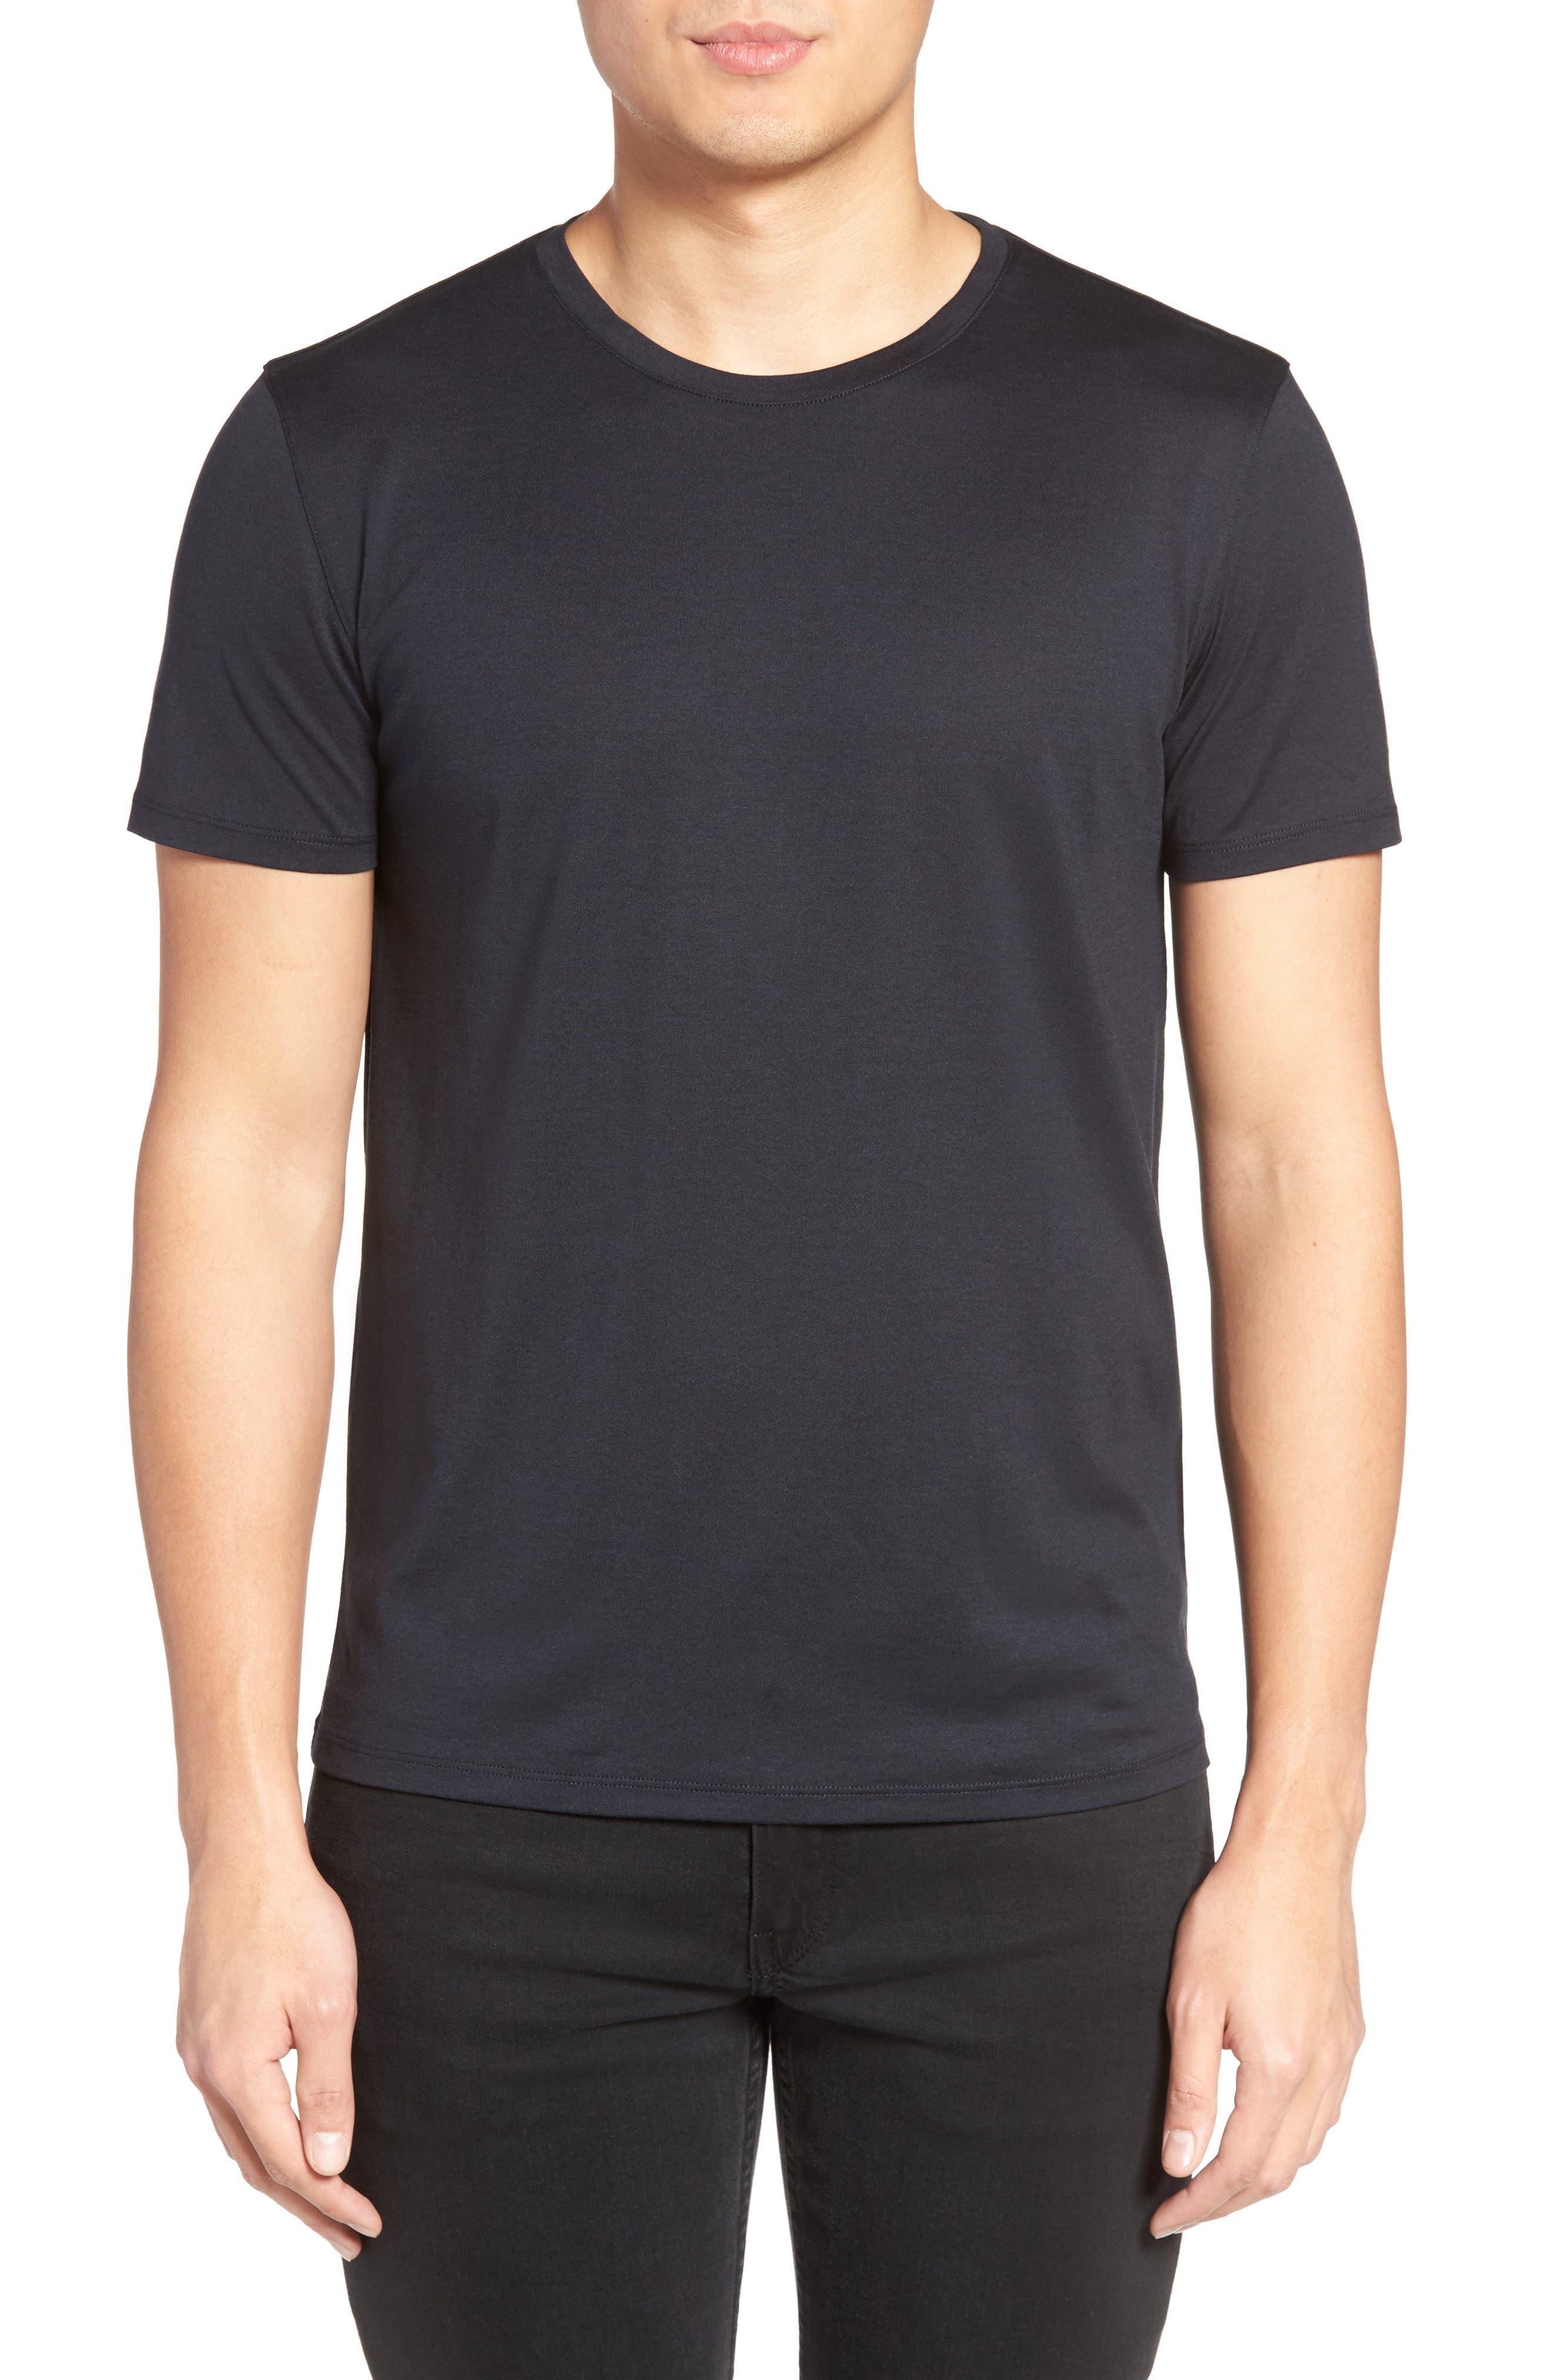 Alternate Image 1 Selected - Theory Silk & Cotton Crewneck T-Shirt